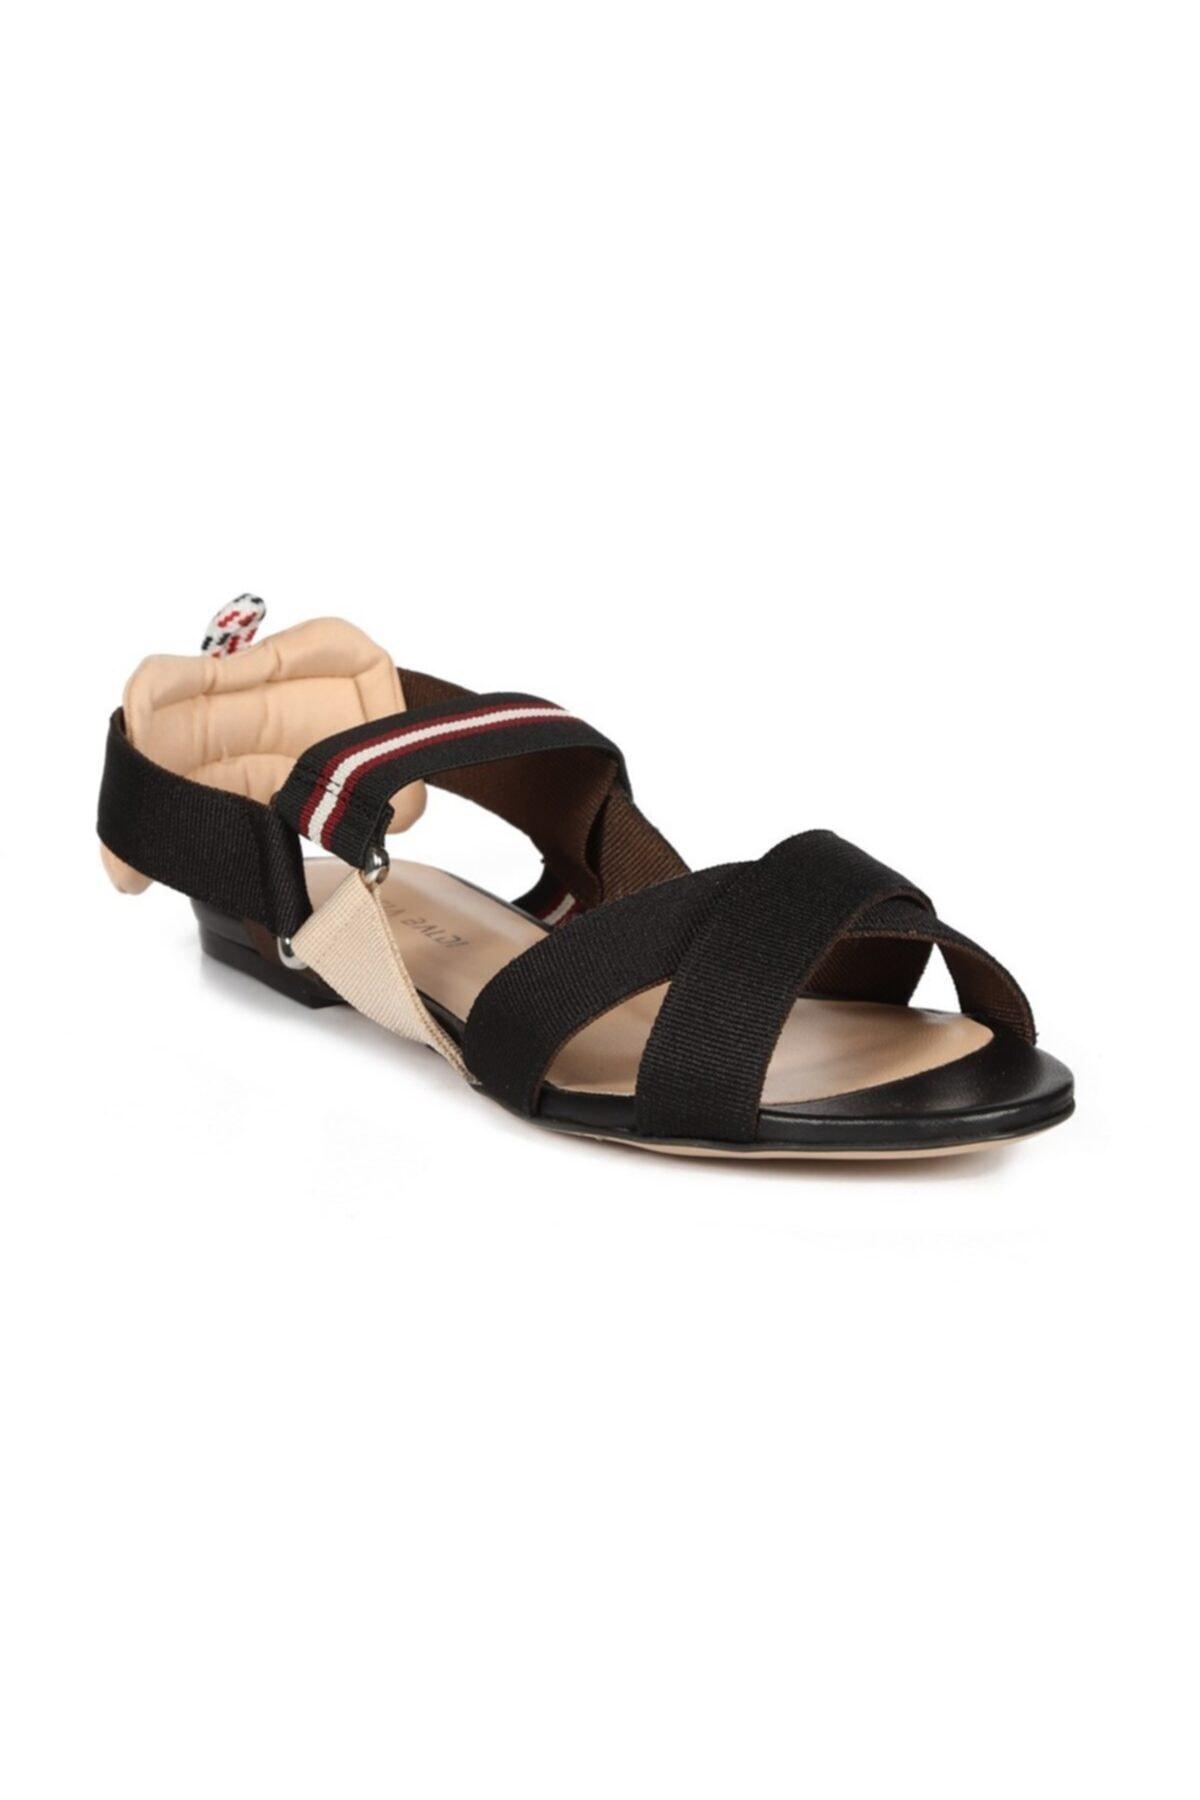 Sofia Baldi Semanta 2 Siyah Kumaş Kadın Düz Sandalet 2